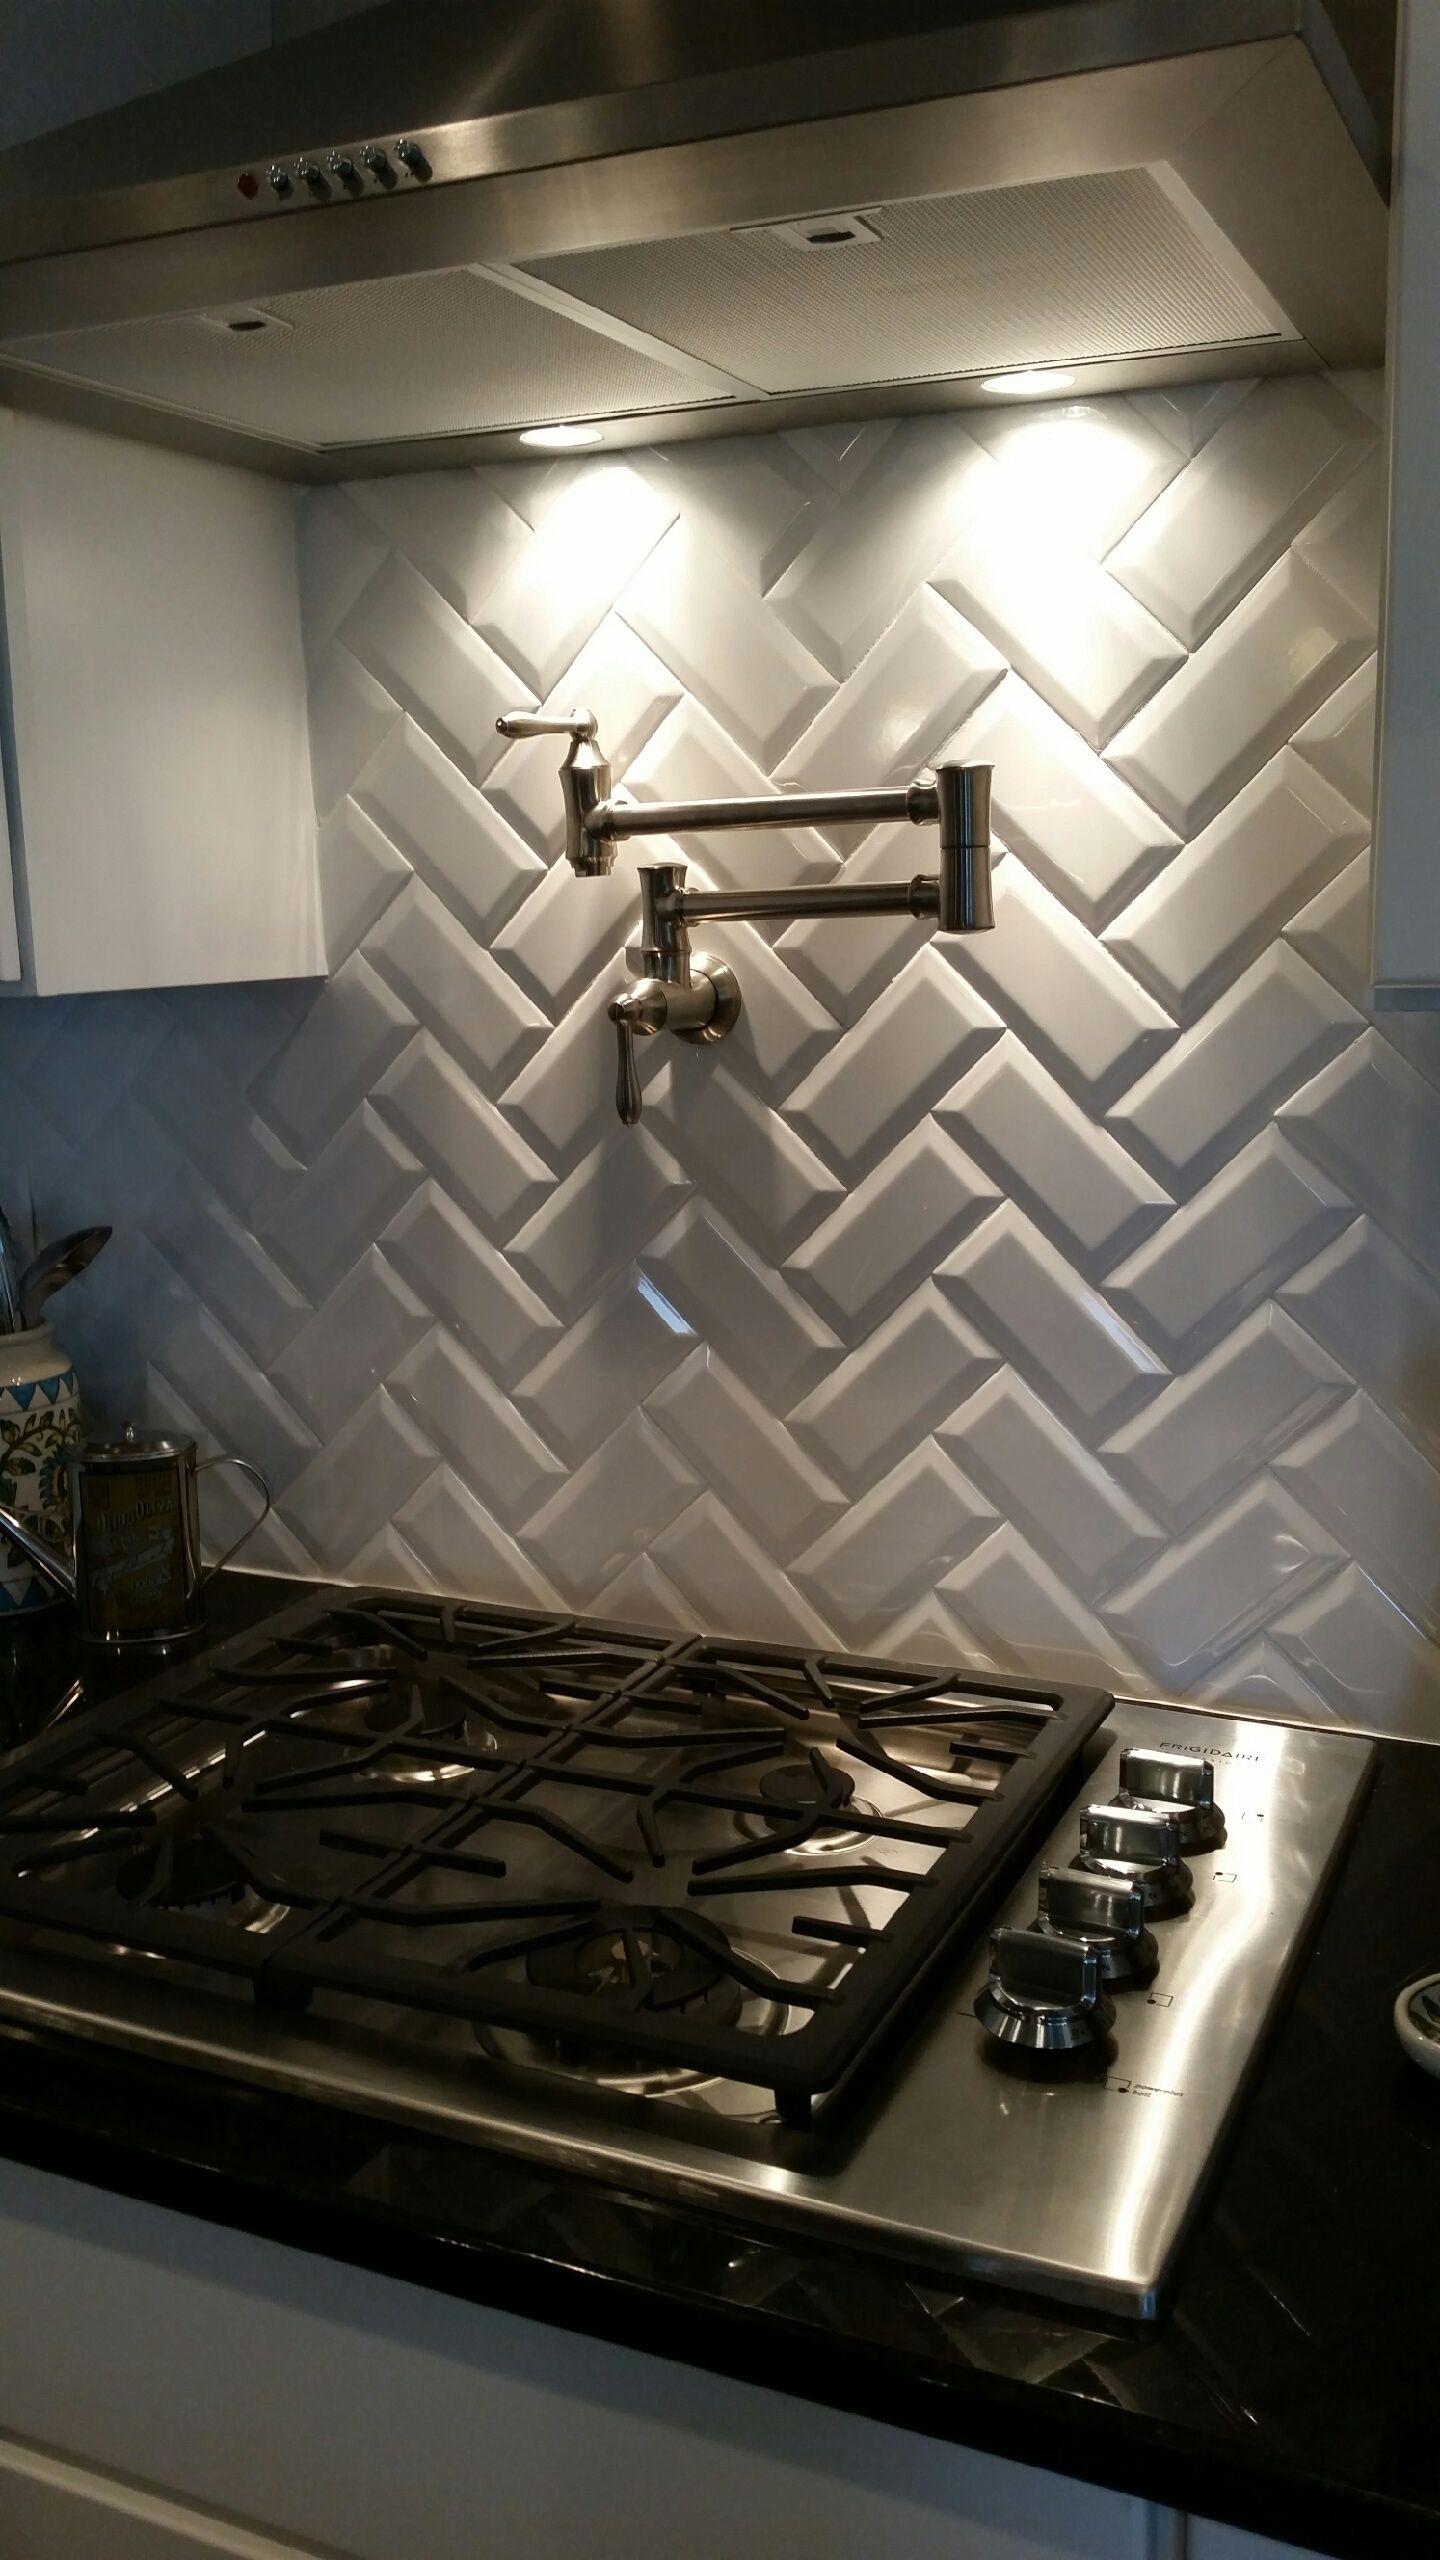 Back Splash White Beveled Subway Tiles In Chevron Pattern With